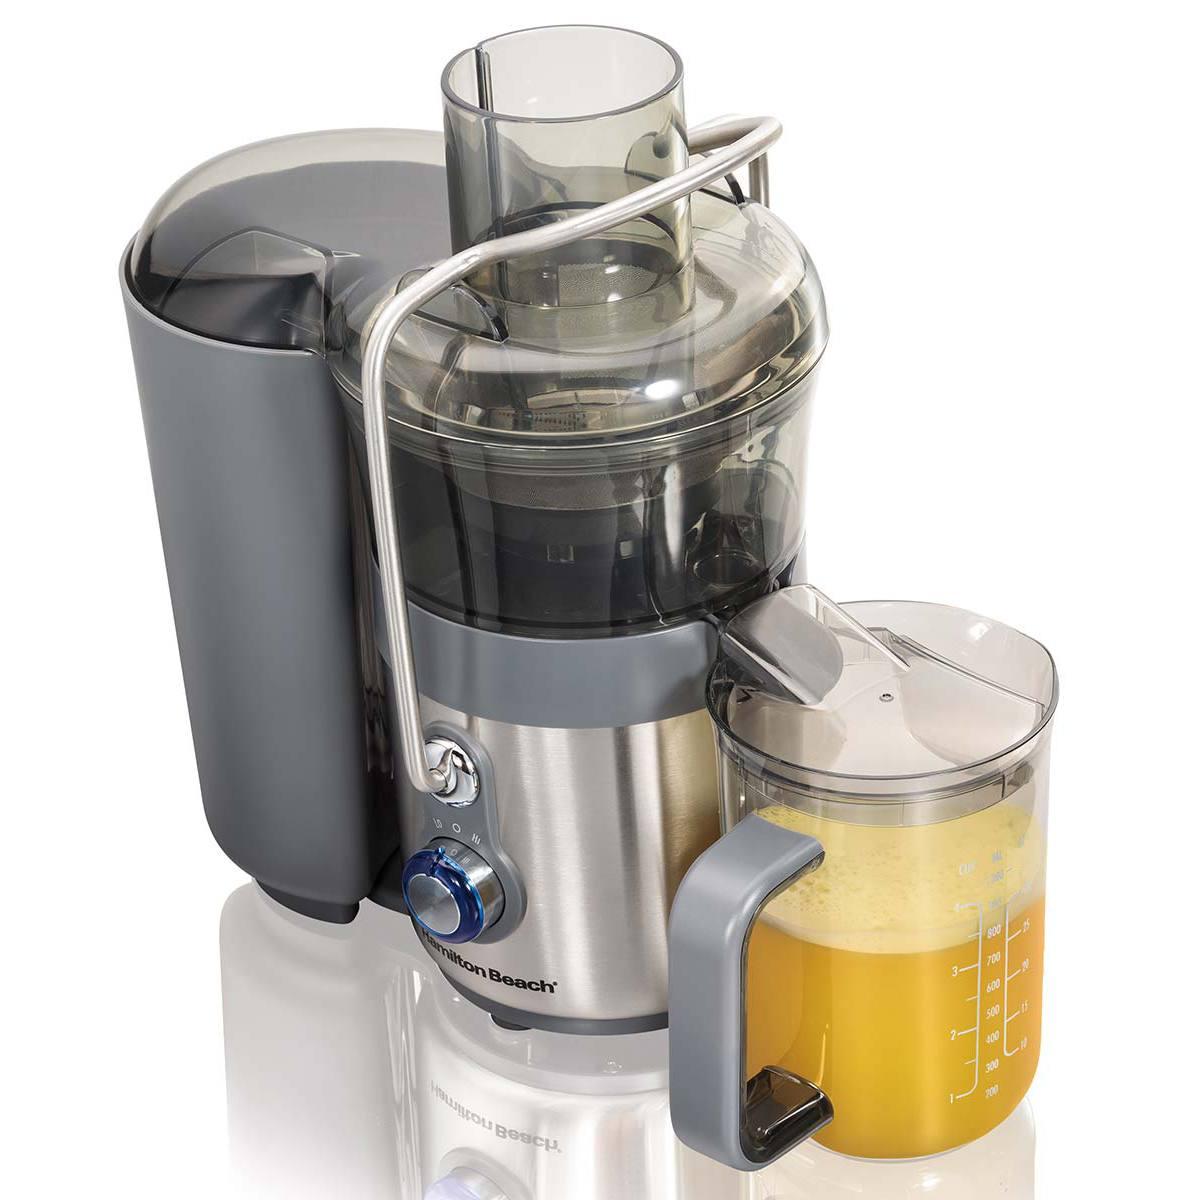 Centrifugal Coffee Maker : Hamilton beach big mouth premium juice extractor